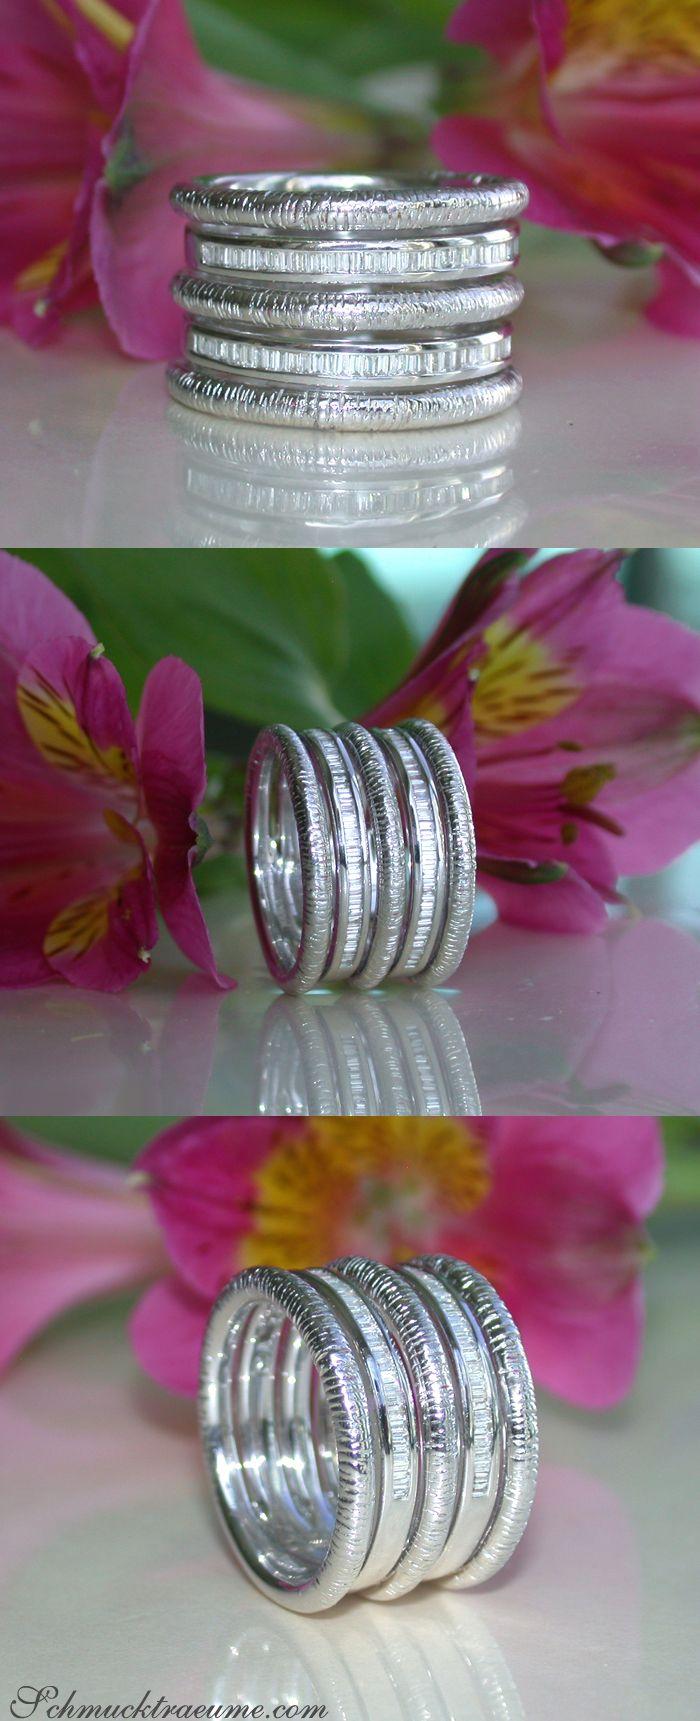 Puristic Whitegold Ring with Diamonds | Puristischer Weißgold Ring mit Diamanten | Explore: Schmucktraeume.com | Like: https://www.facebook.com/pages/Noble-Juwelen/150871984924926